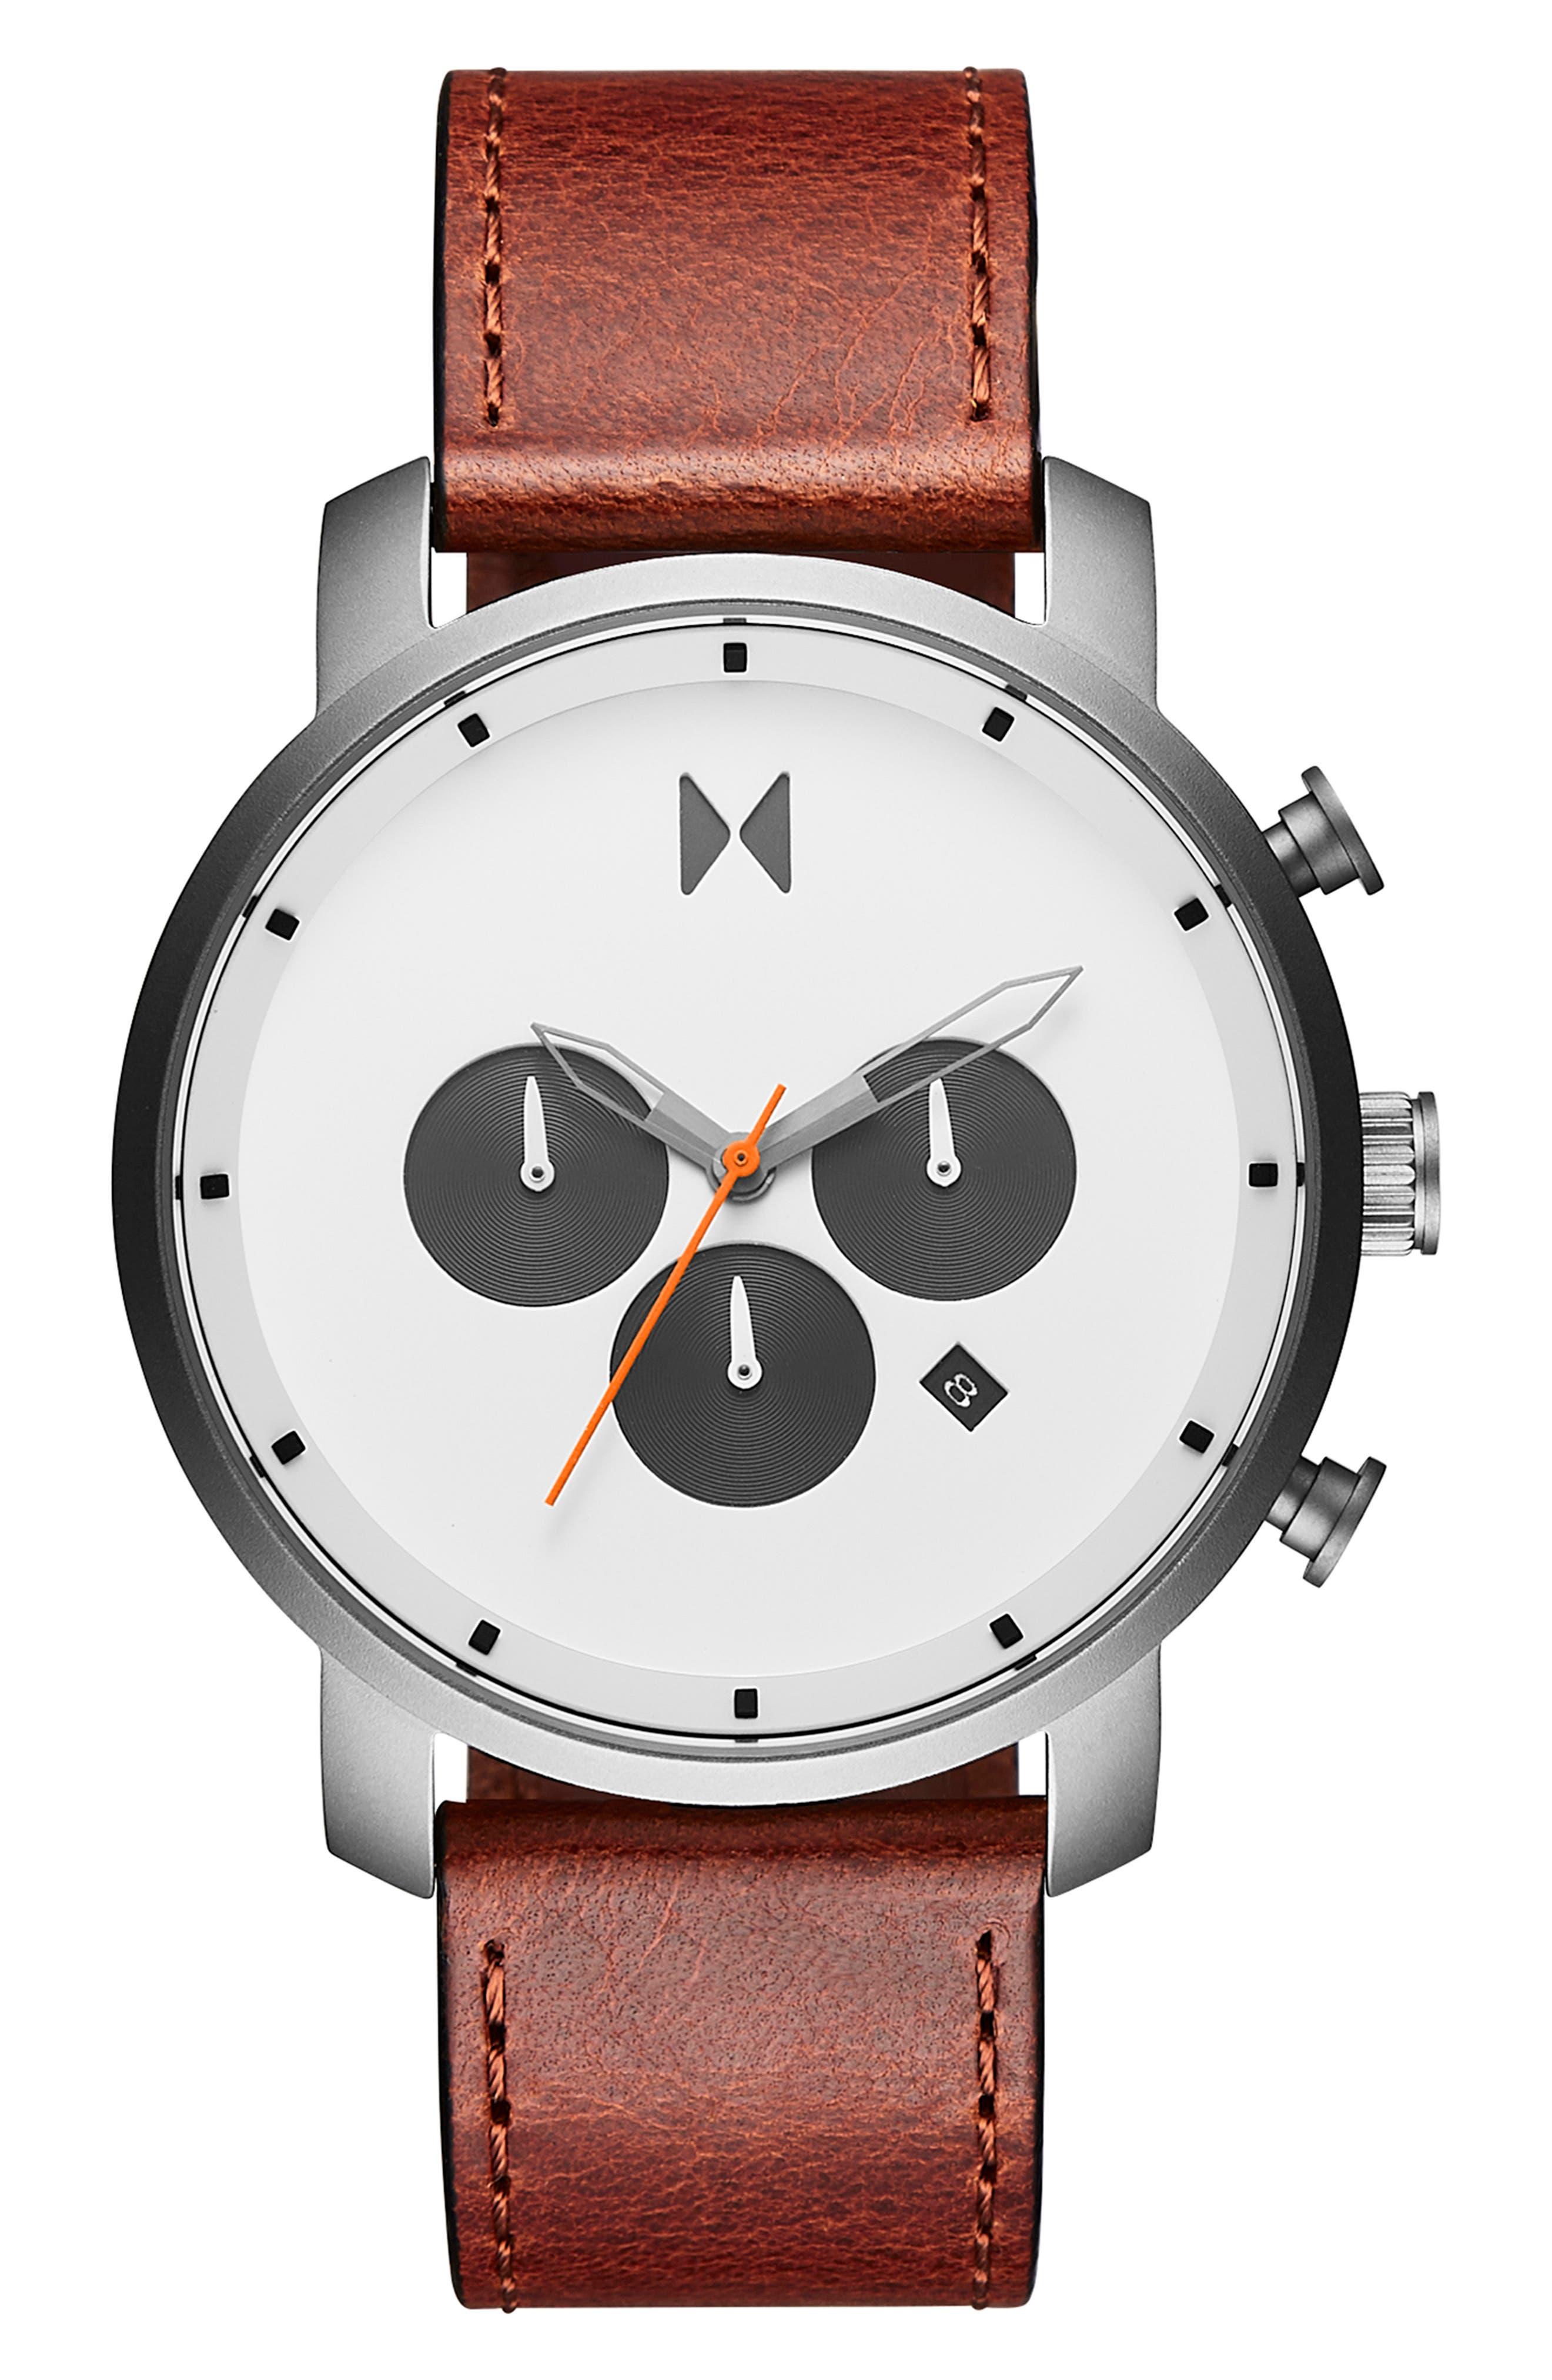 Chrono Chronograph Leather Strap Watch